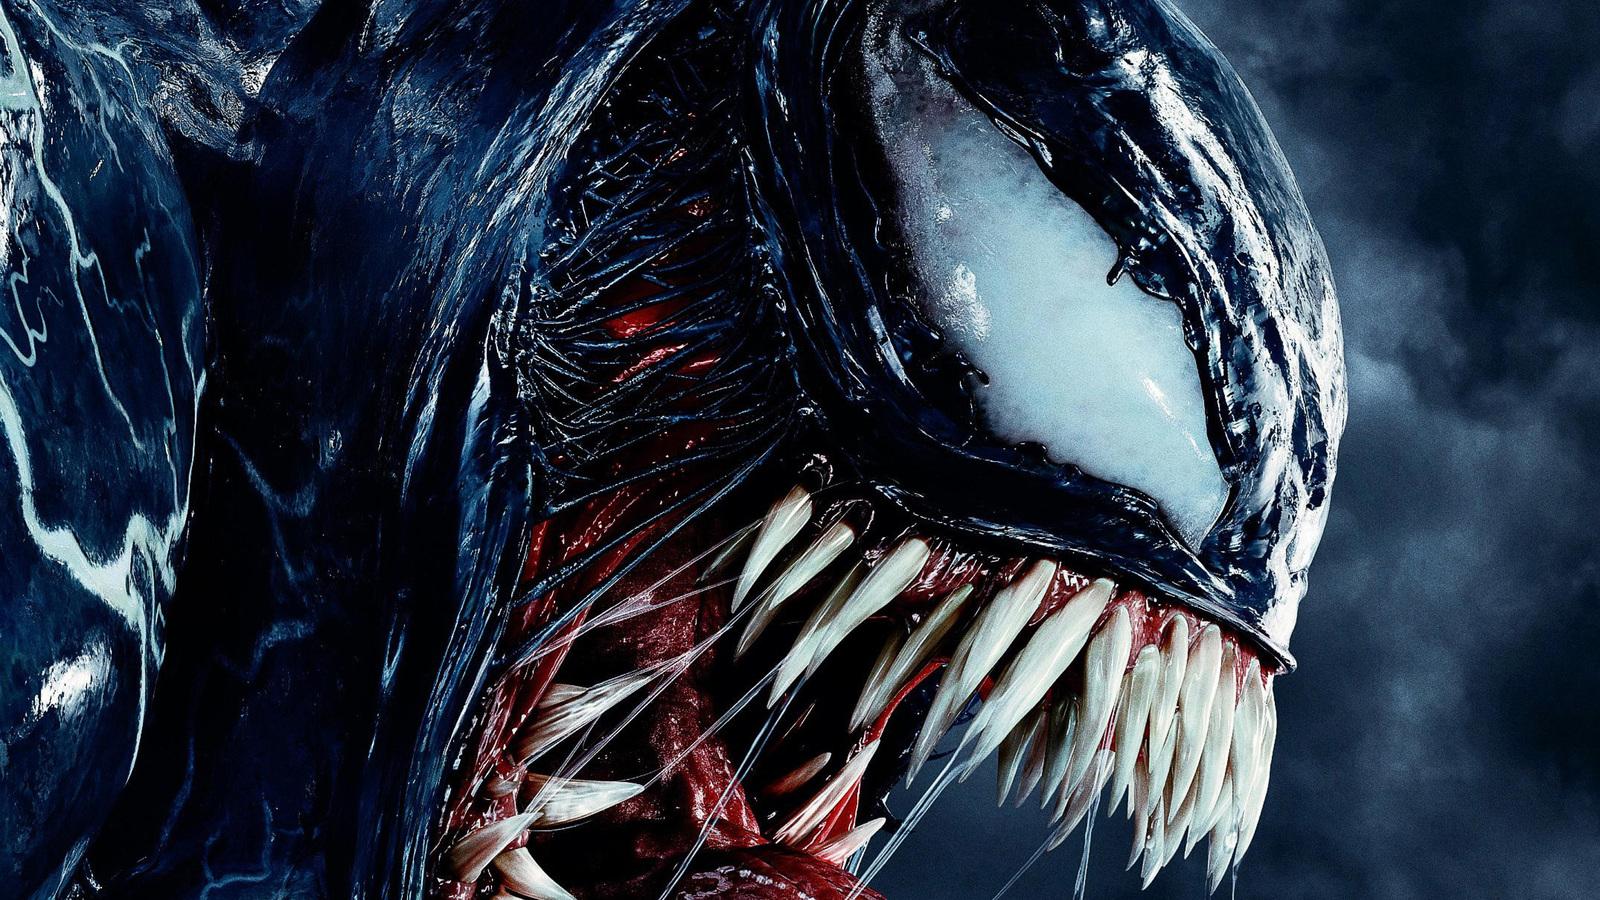 1600x900 Venom Movie Japanese Poster 1600x900 Resolution ...